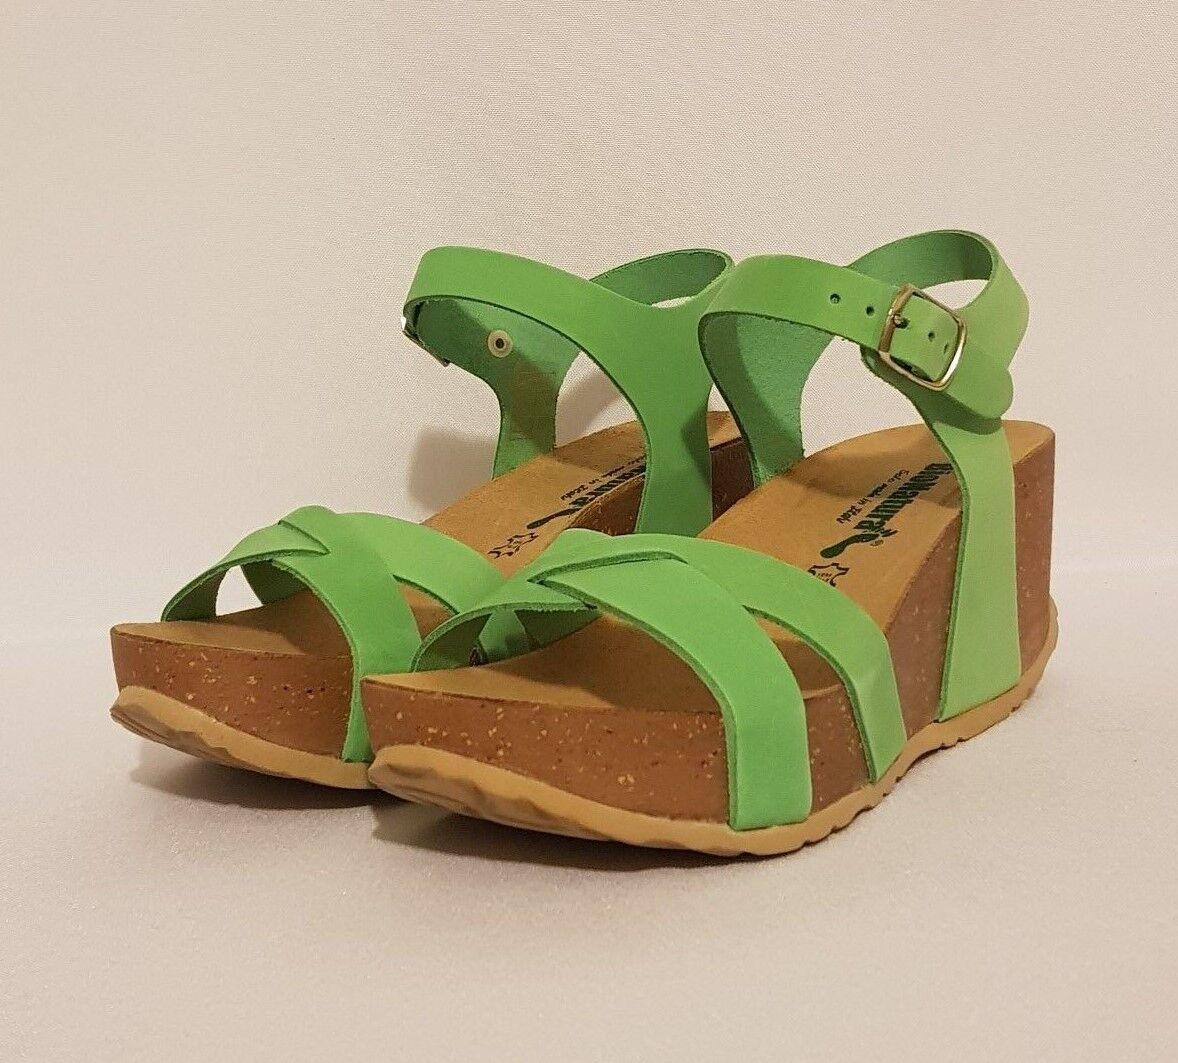 BioNatura 24 Fregene Orange, Turquoise Blue, Sandals Green, Nubuck Leather Wedge Sandals Blue, 643c24